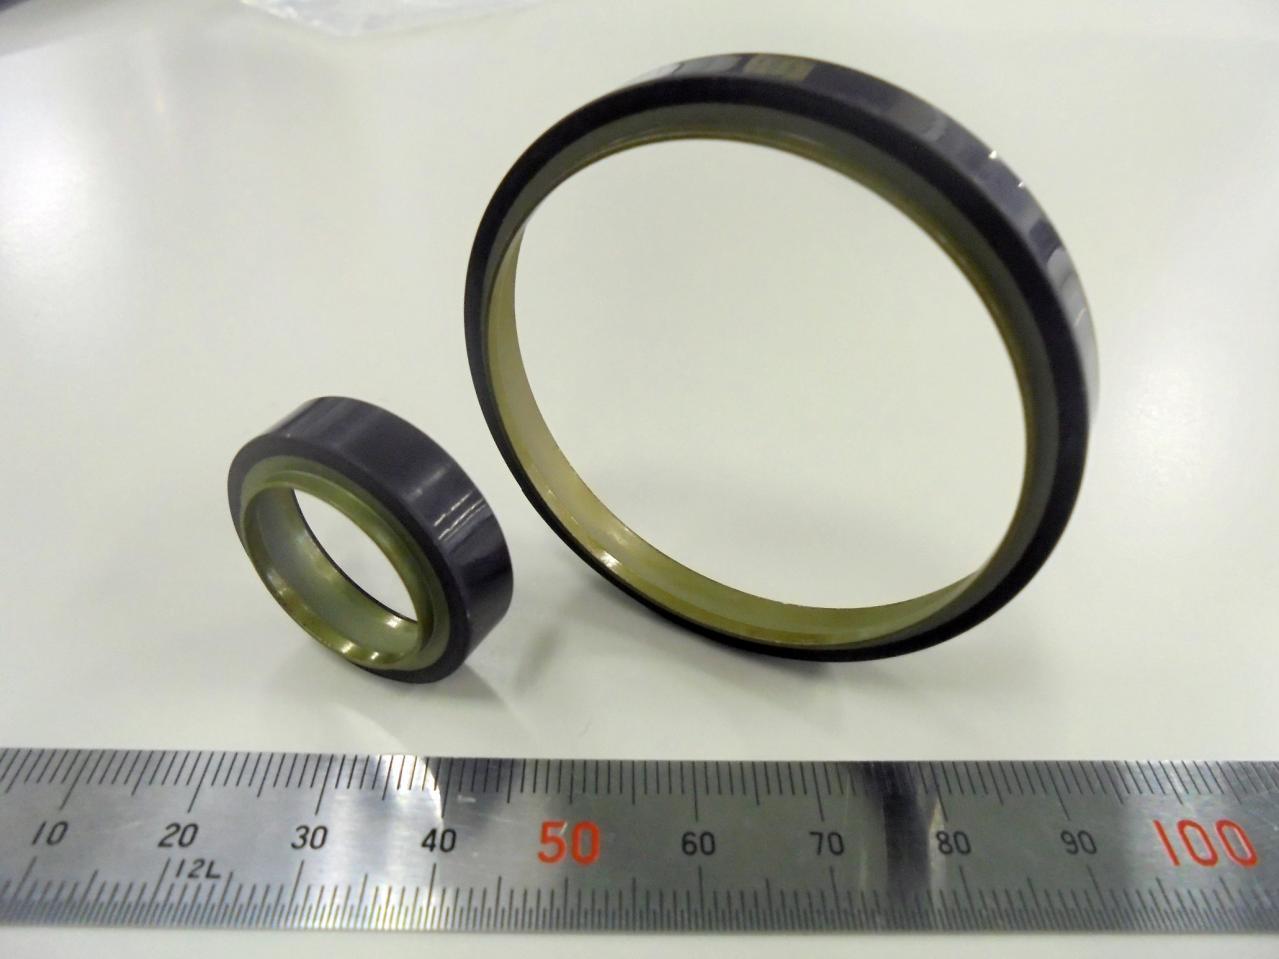 NTN:「複列磁気リング」シリーズに小型サイズを追加